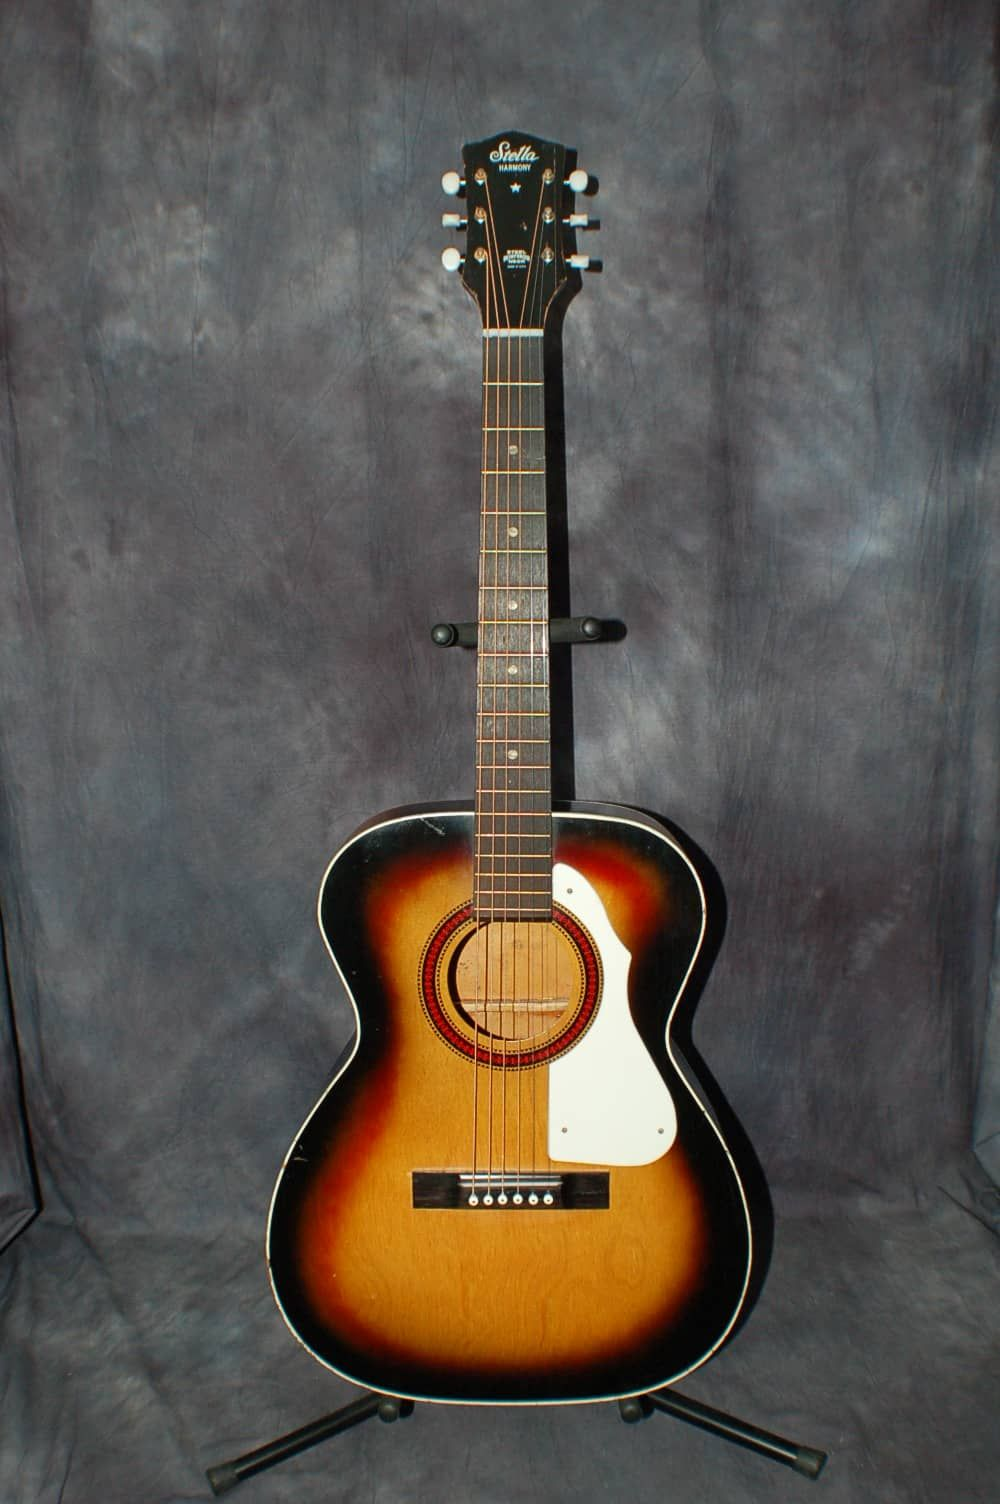 1968 Harmony Stella Model H942 Concert Size Pro Setup Original Case Lawman Guitars Reverb The Originals Really Cool Stuff Cool Guitar